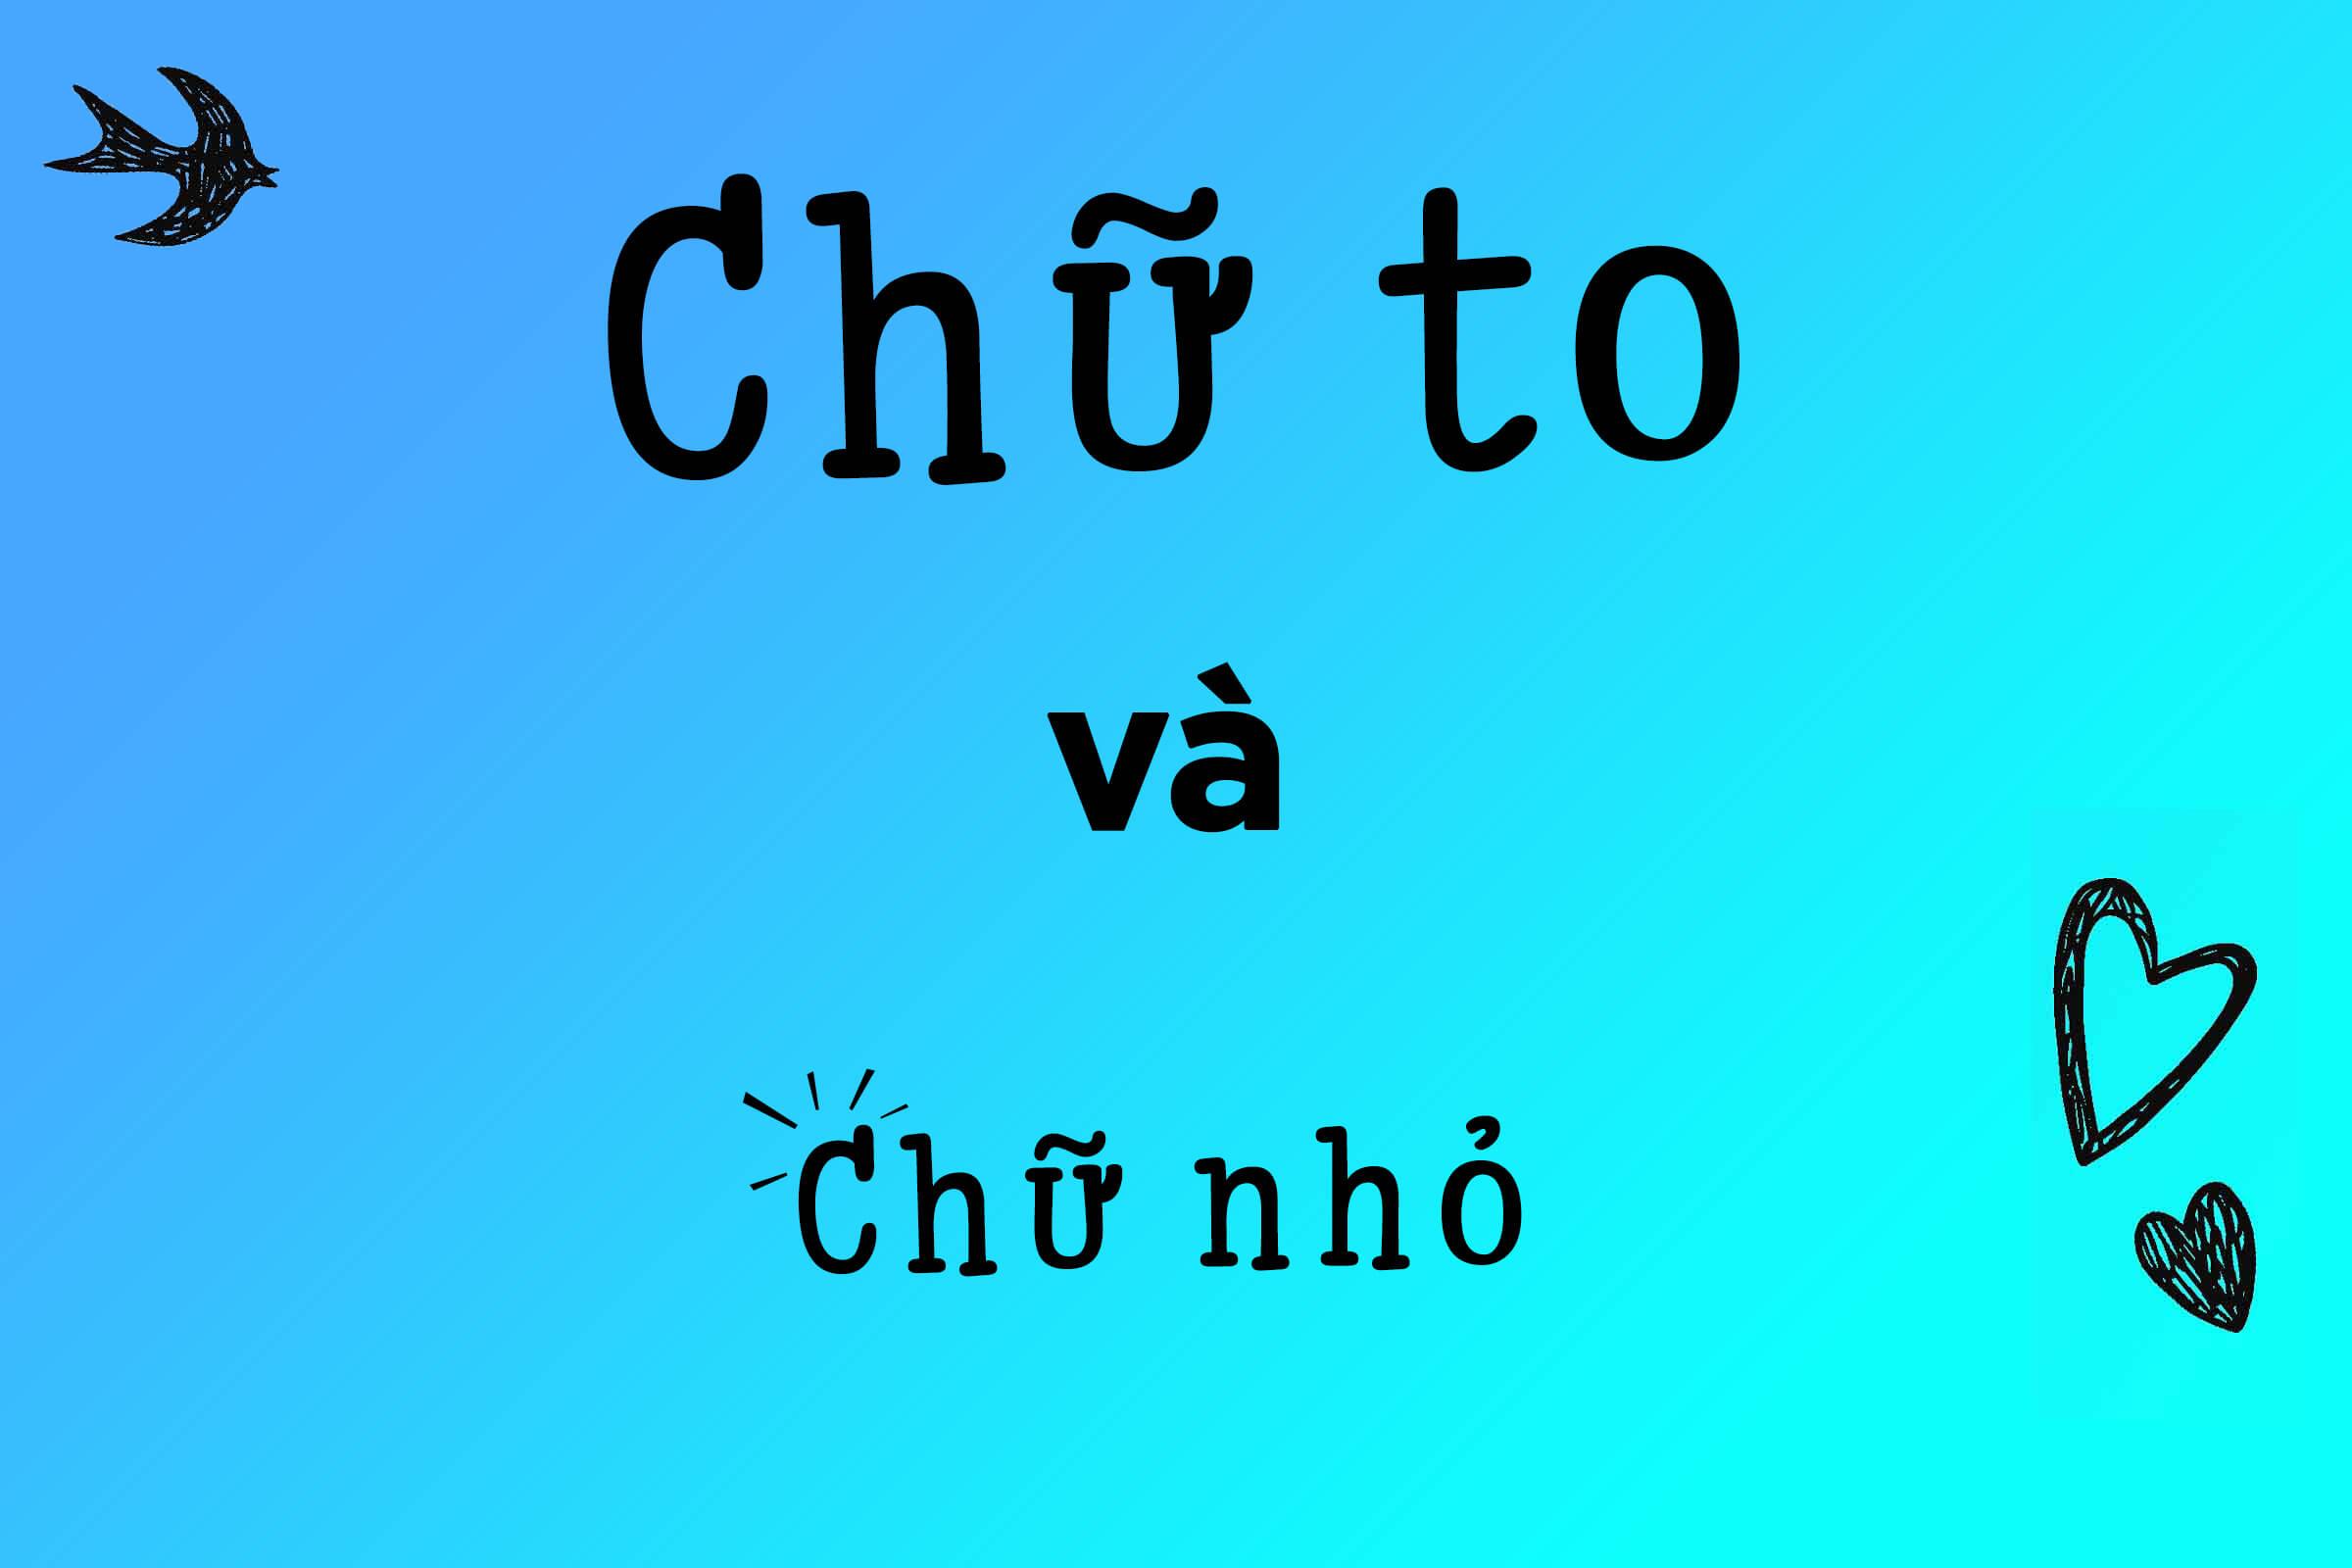 nhin-chu-doan-tinh-cach-huong-di-moi-giup-sep-doc-vi-nhan-vien-2